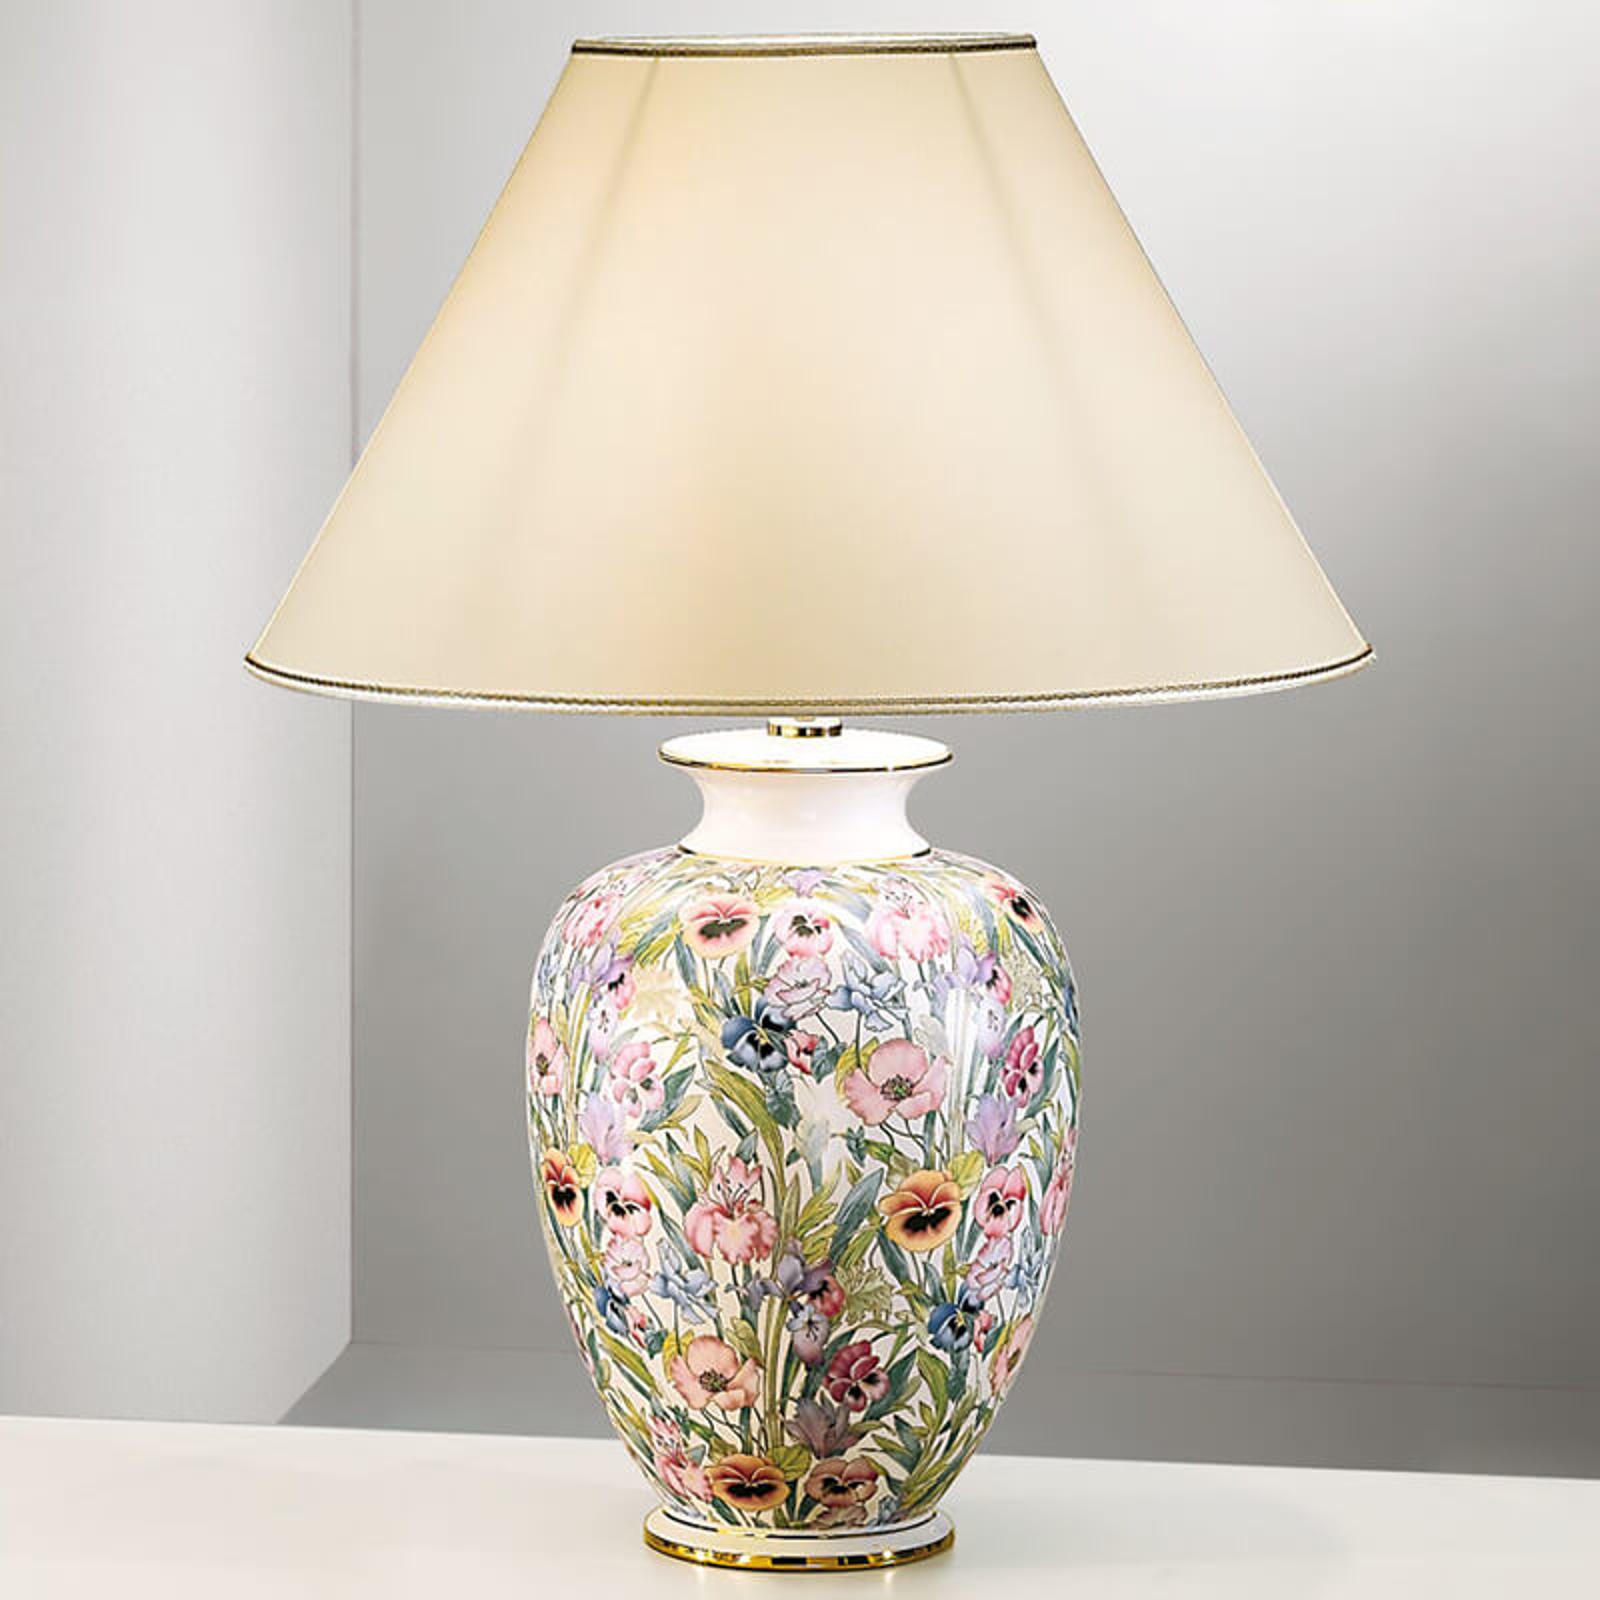 GIARDINO PANSE handmålad bordslampa 50 cm